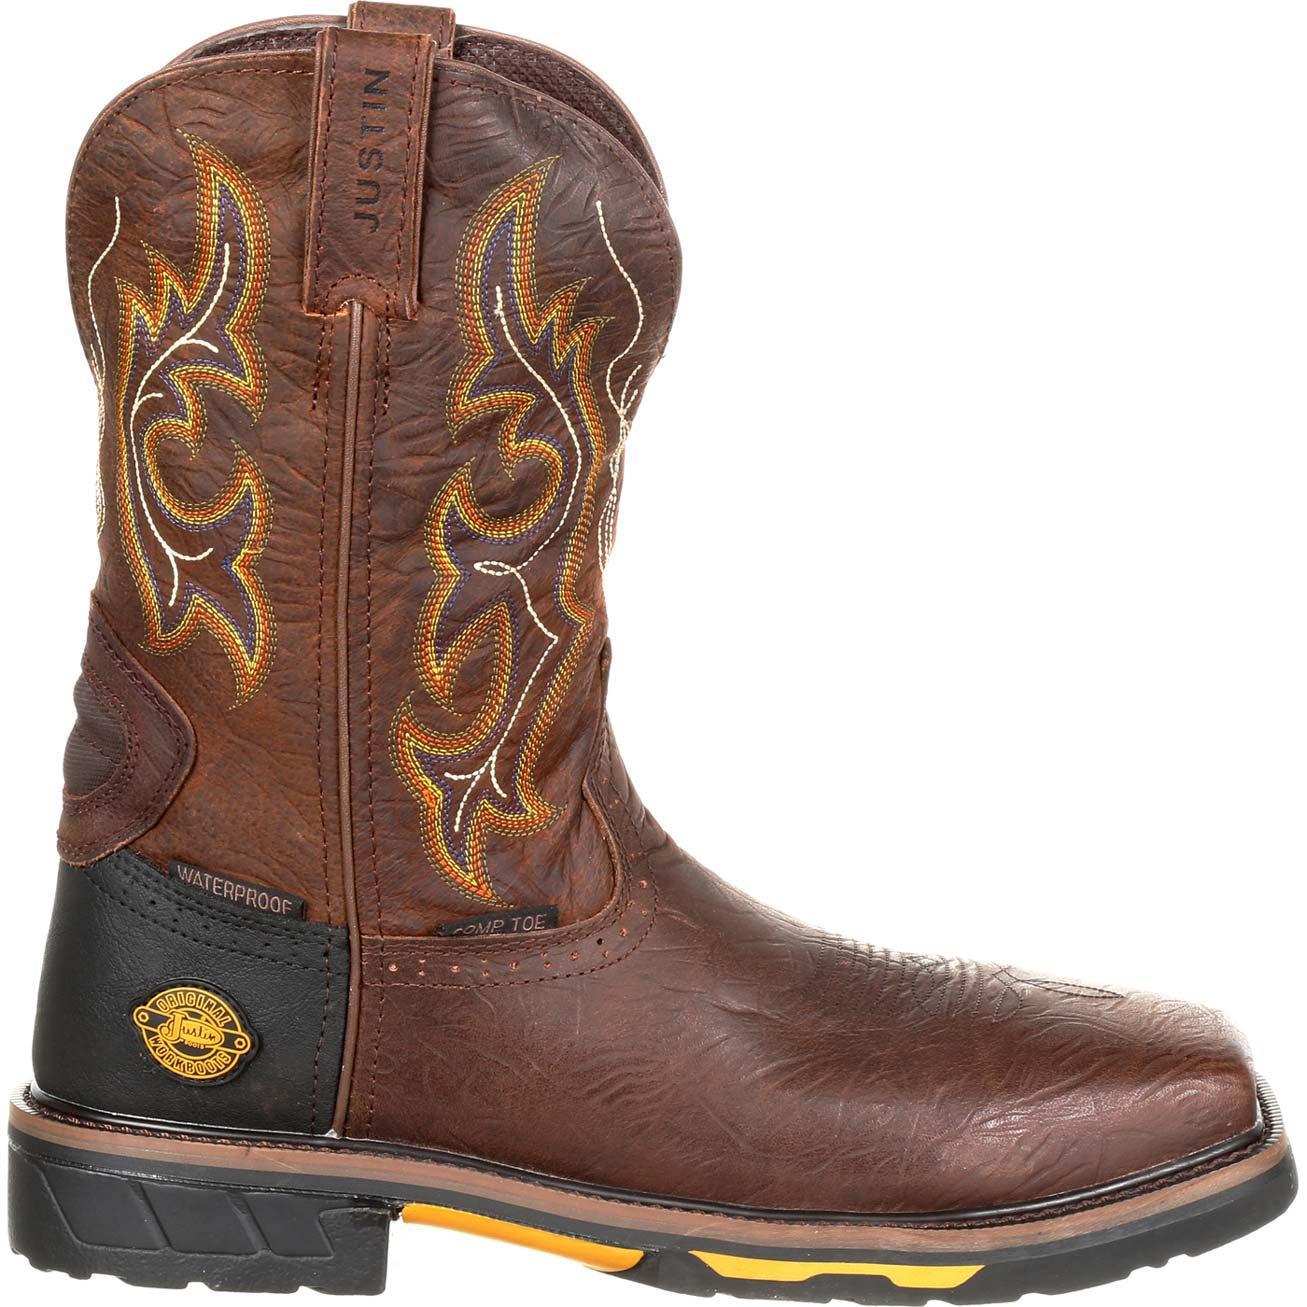 8e2fe8c3599 Justin Work Hybred® Joist Composite Toe Waterproof Western Work Boot